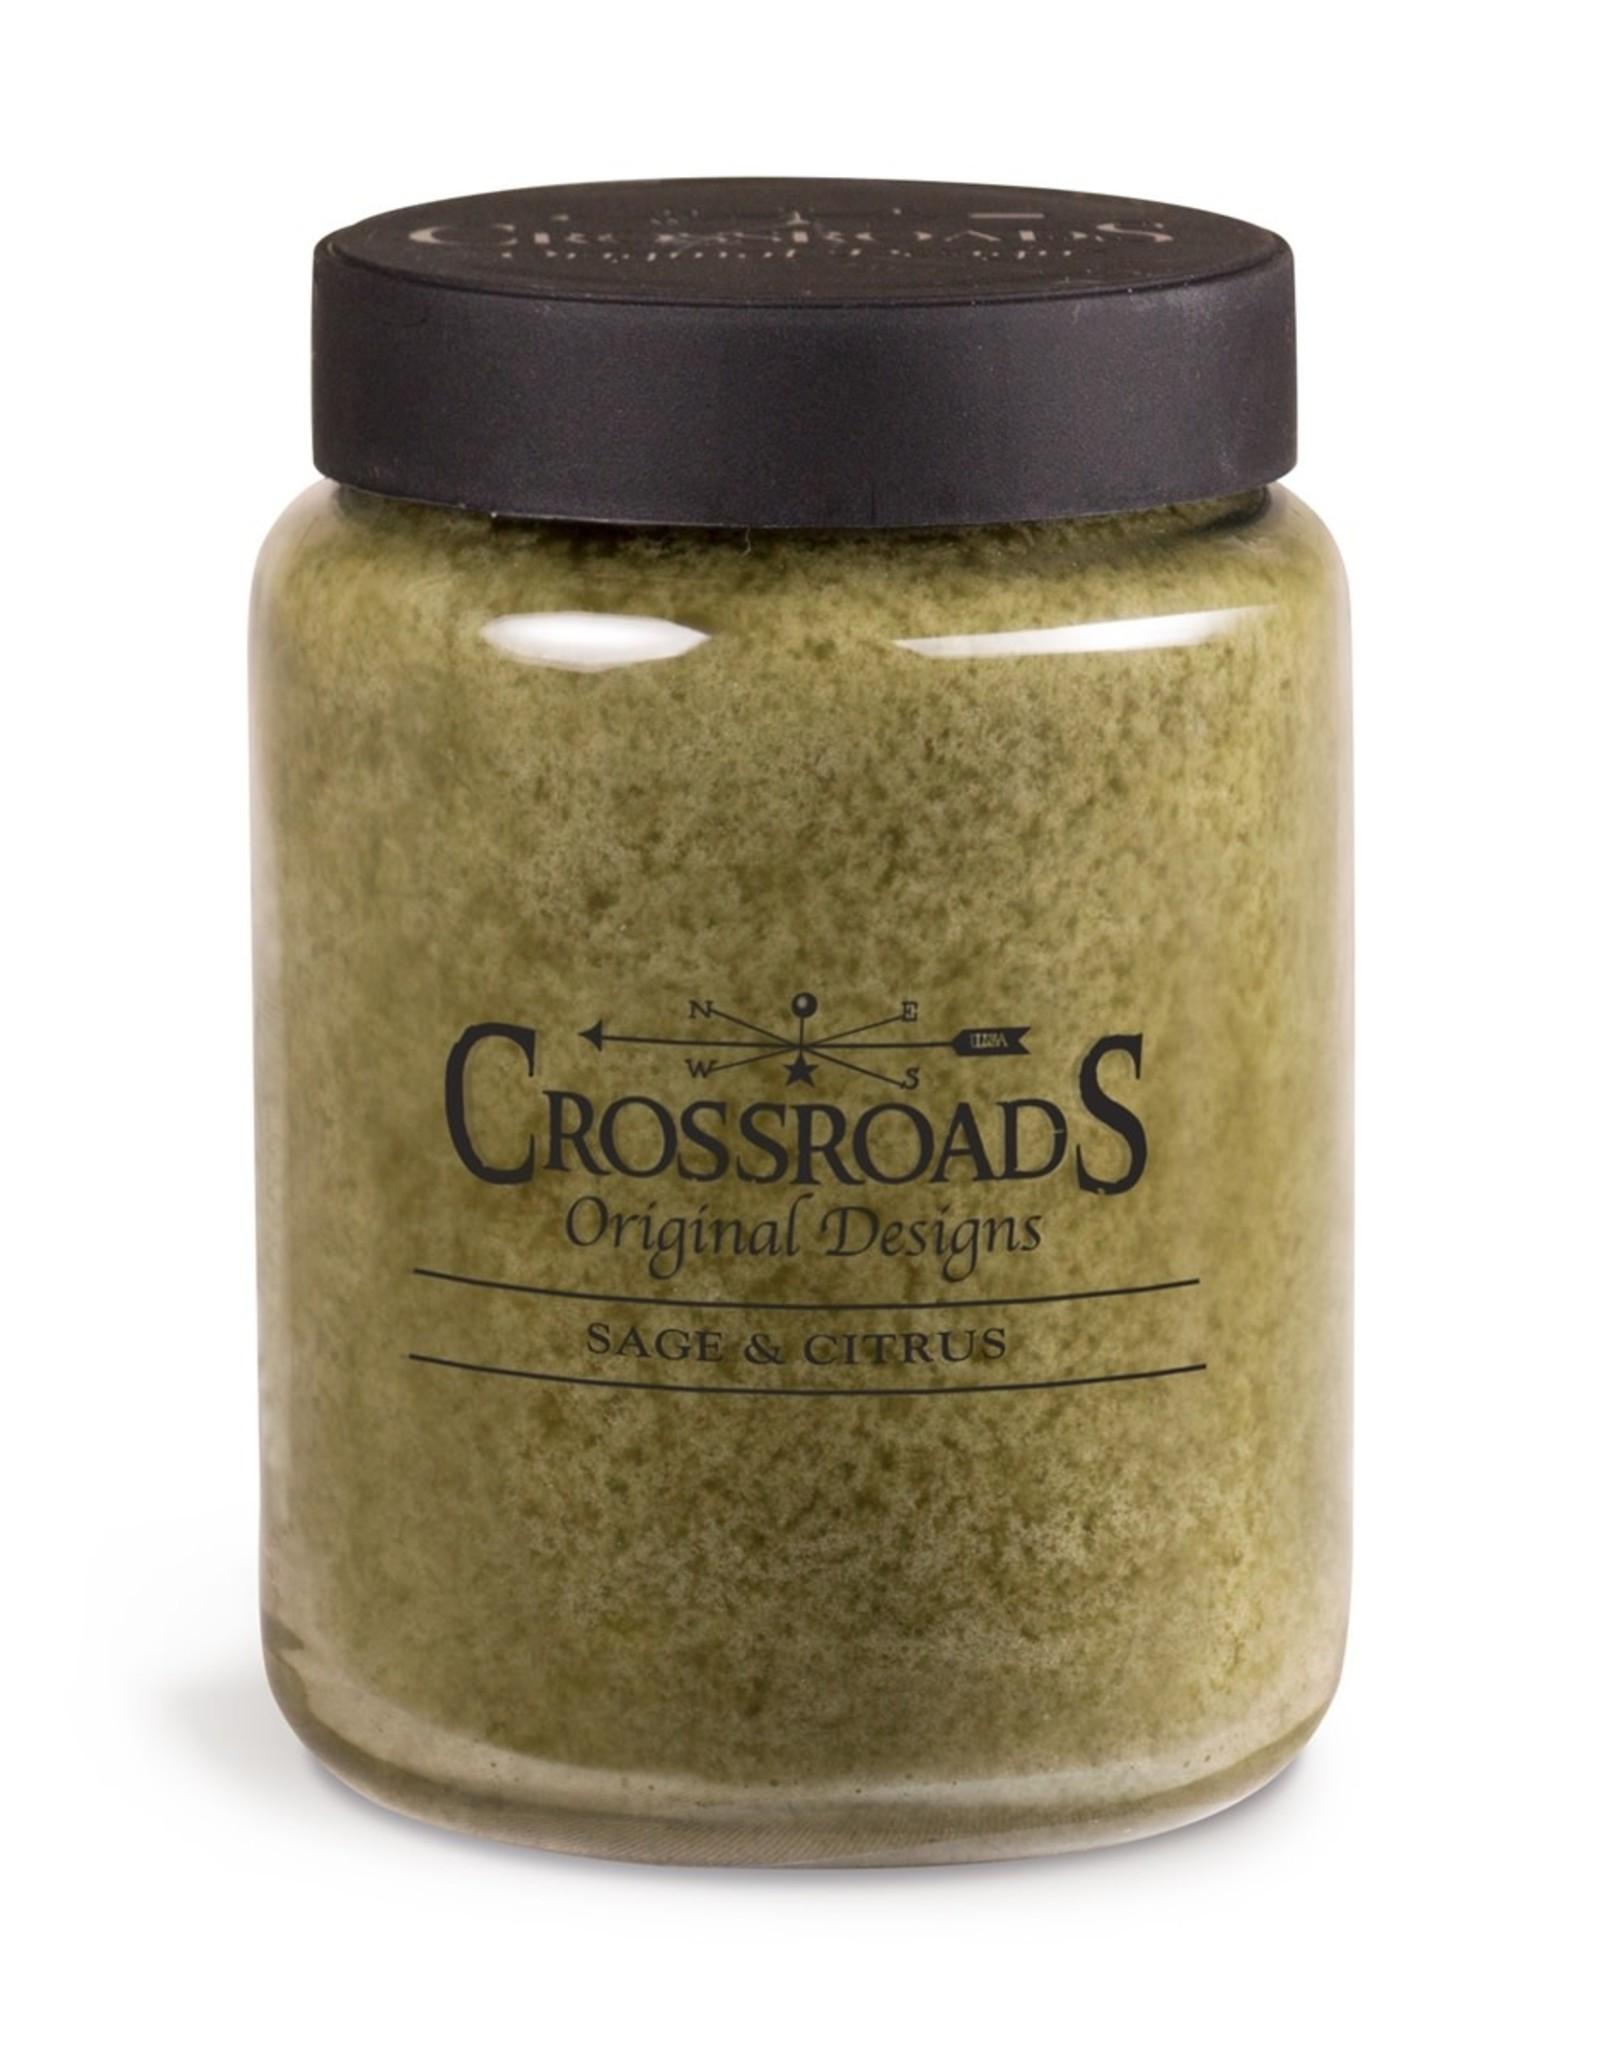 Crossroads Sage & Citrus Candle